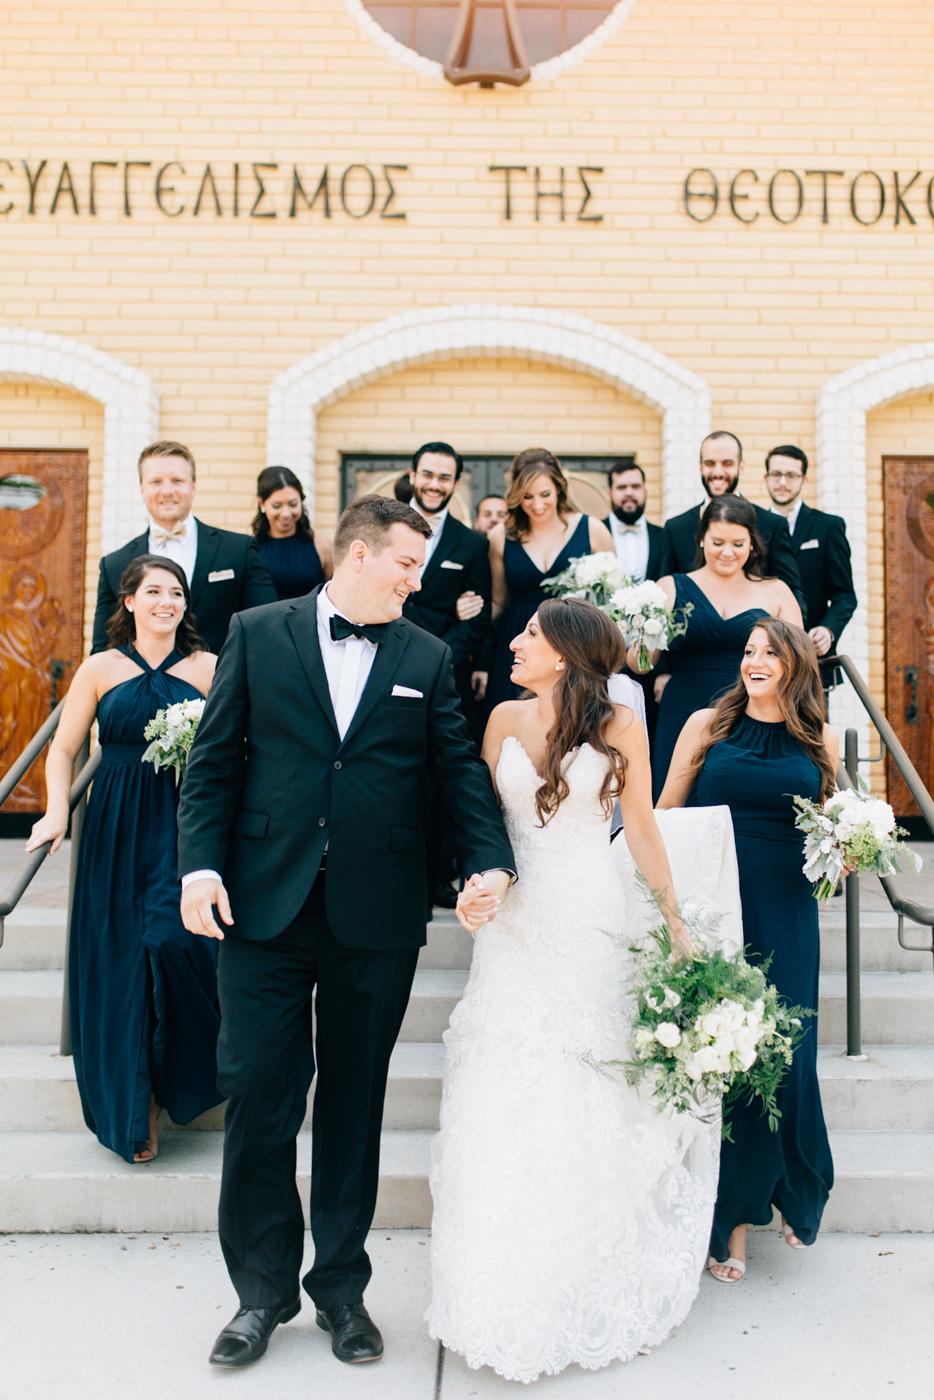 four corners photography greek wedding atlanta greek wedding photographer Annunciation Greek Orthodox Cathedral atlanta wedding photographer (31 of 69).jpg